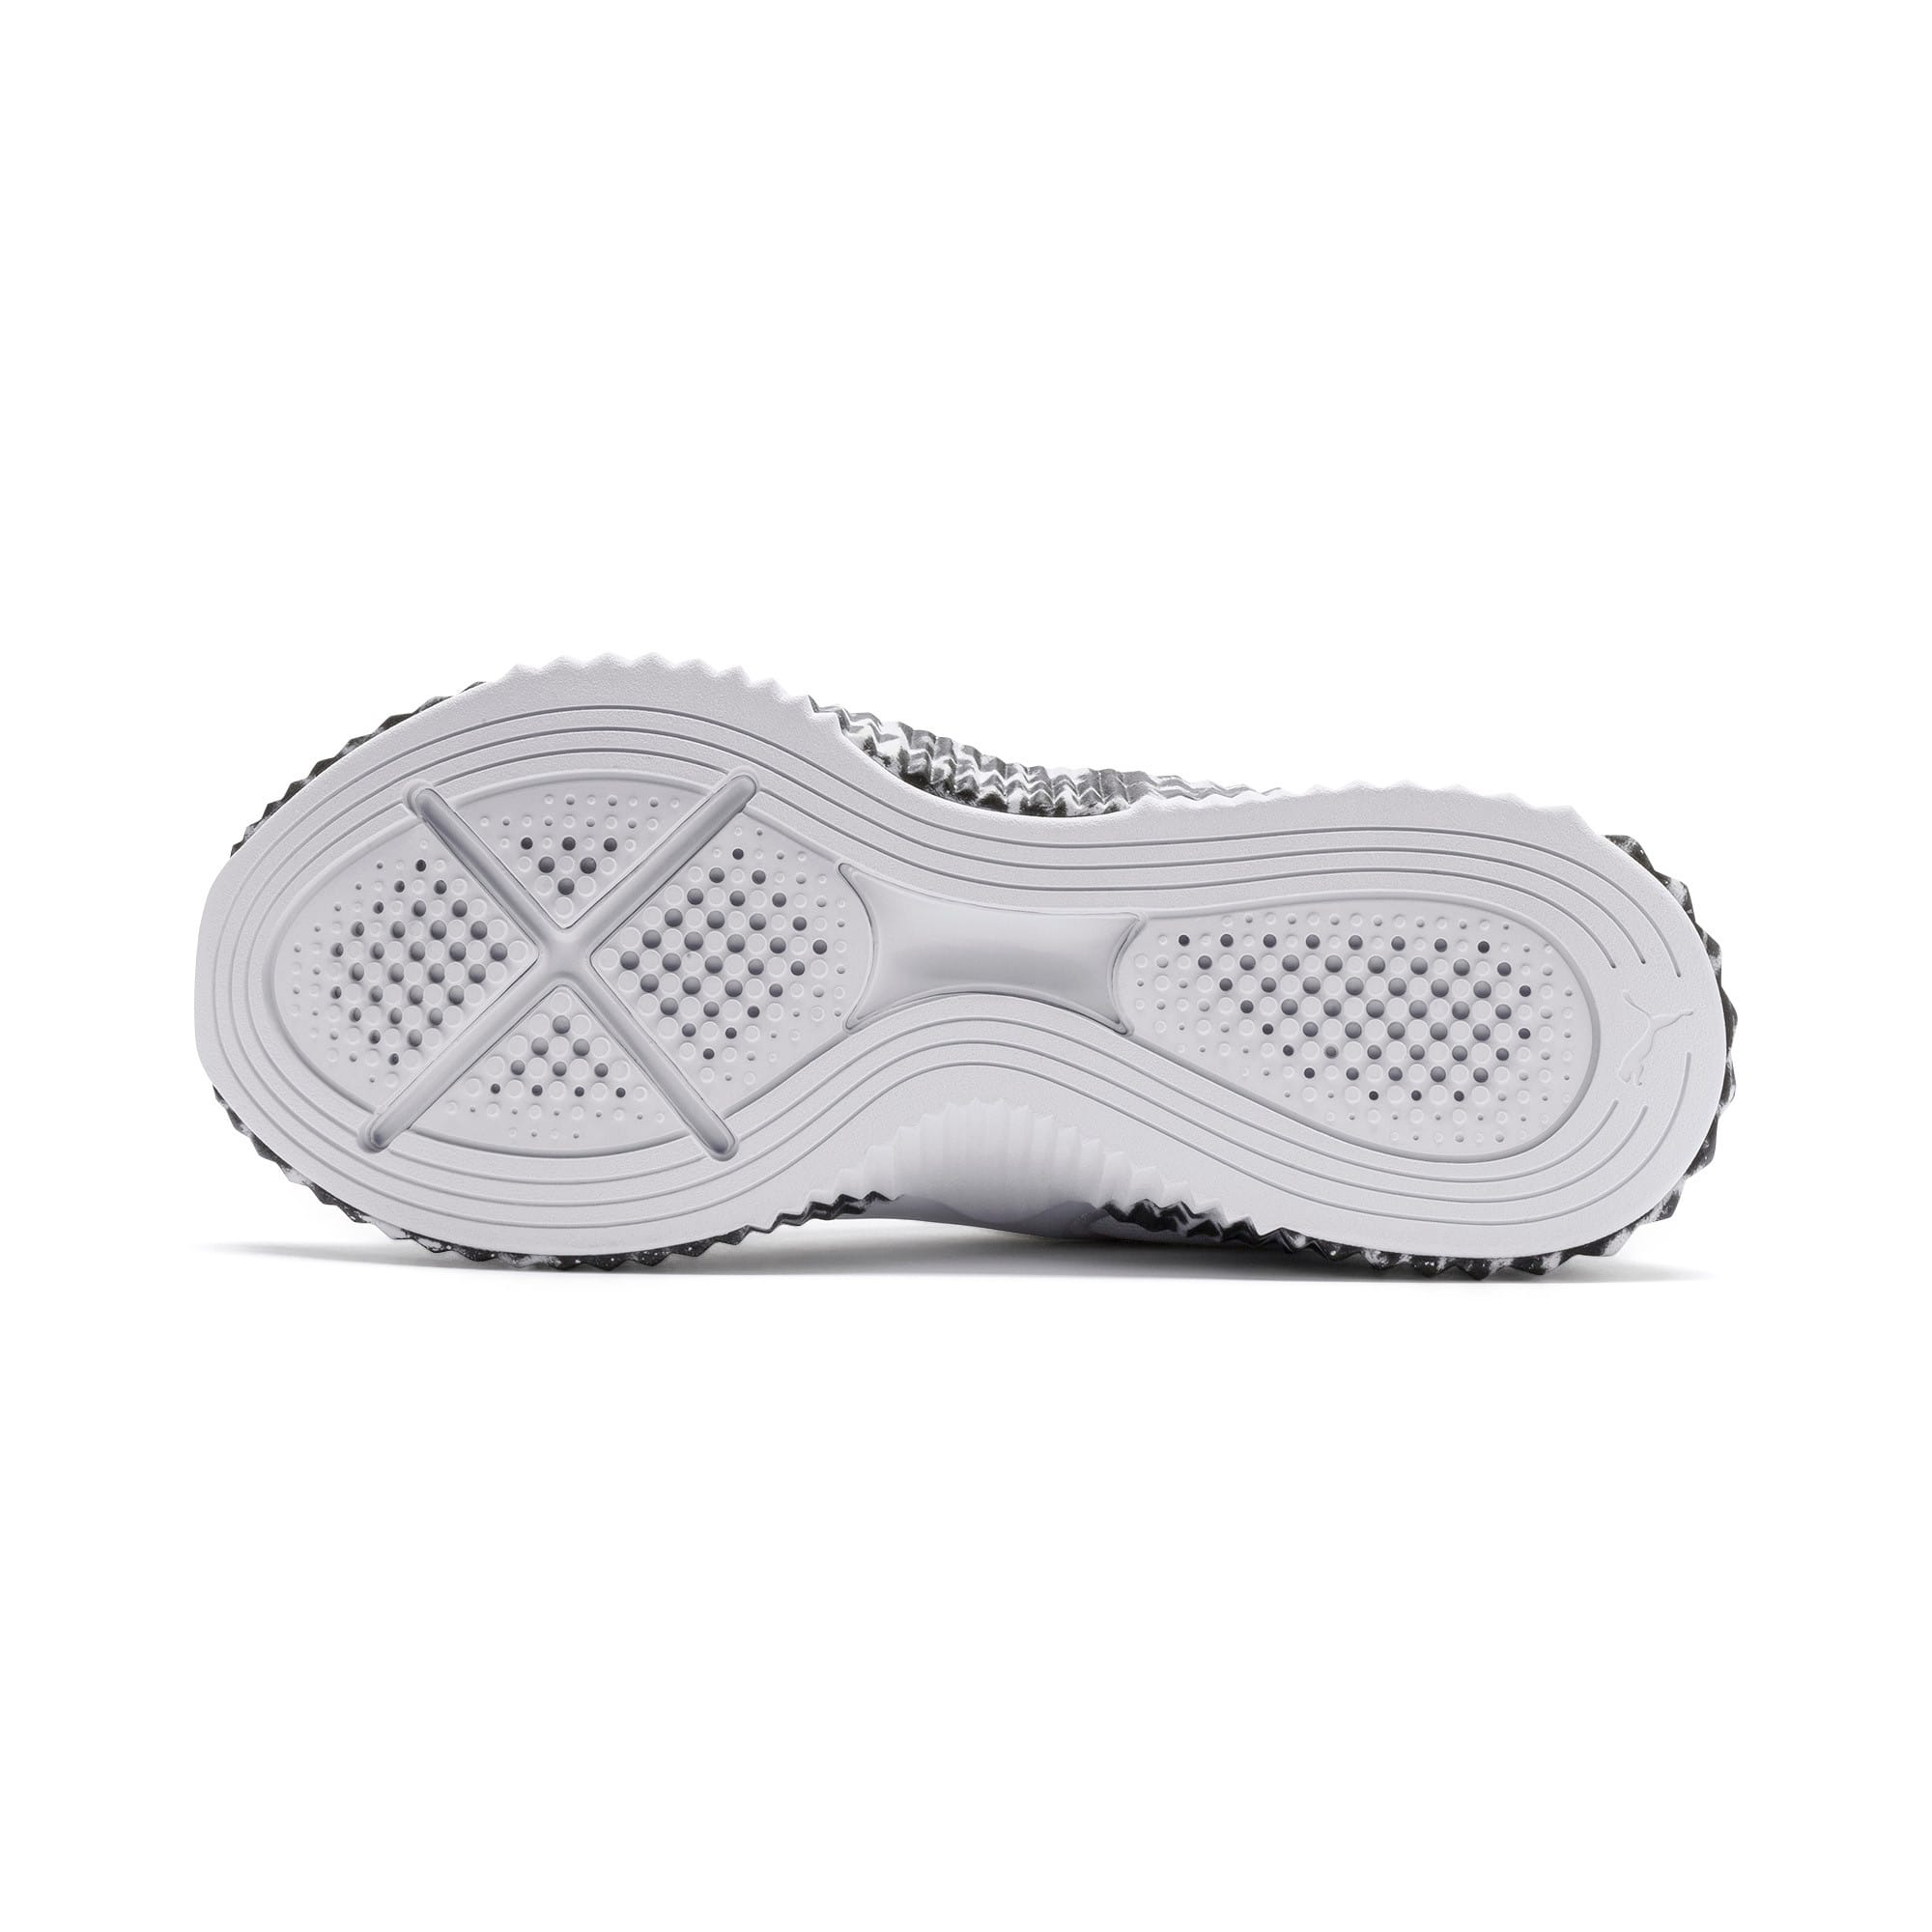 Thumbnail 5 of Defy Leopard Women's Sneakers, Puma White-Puma Black, medium